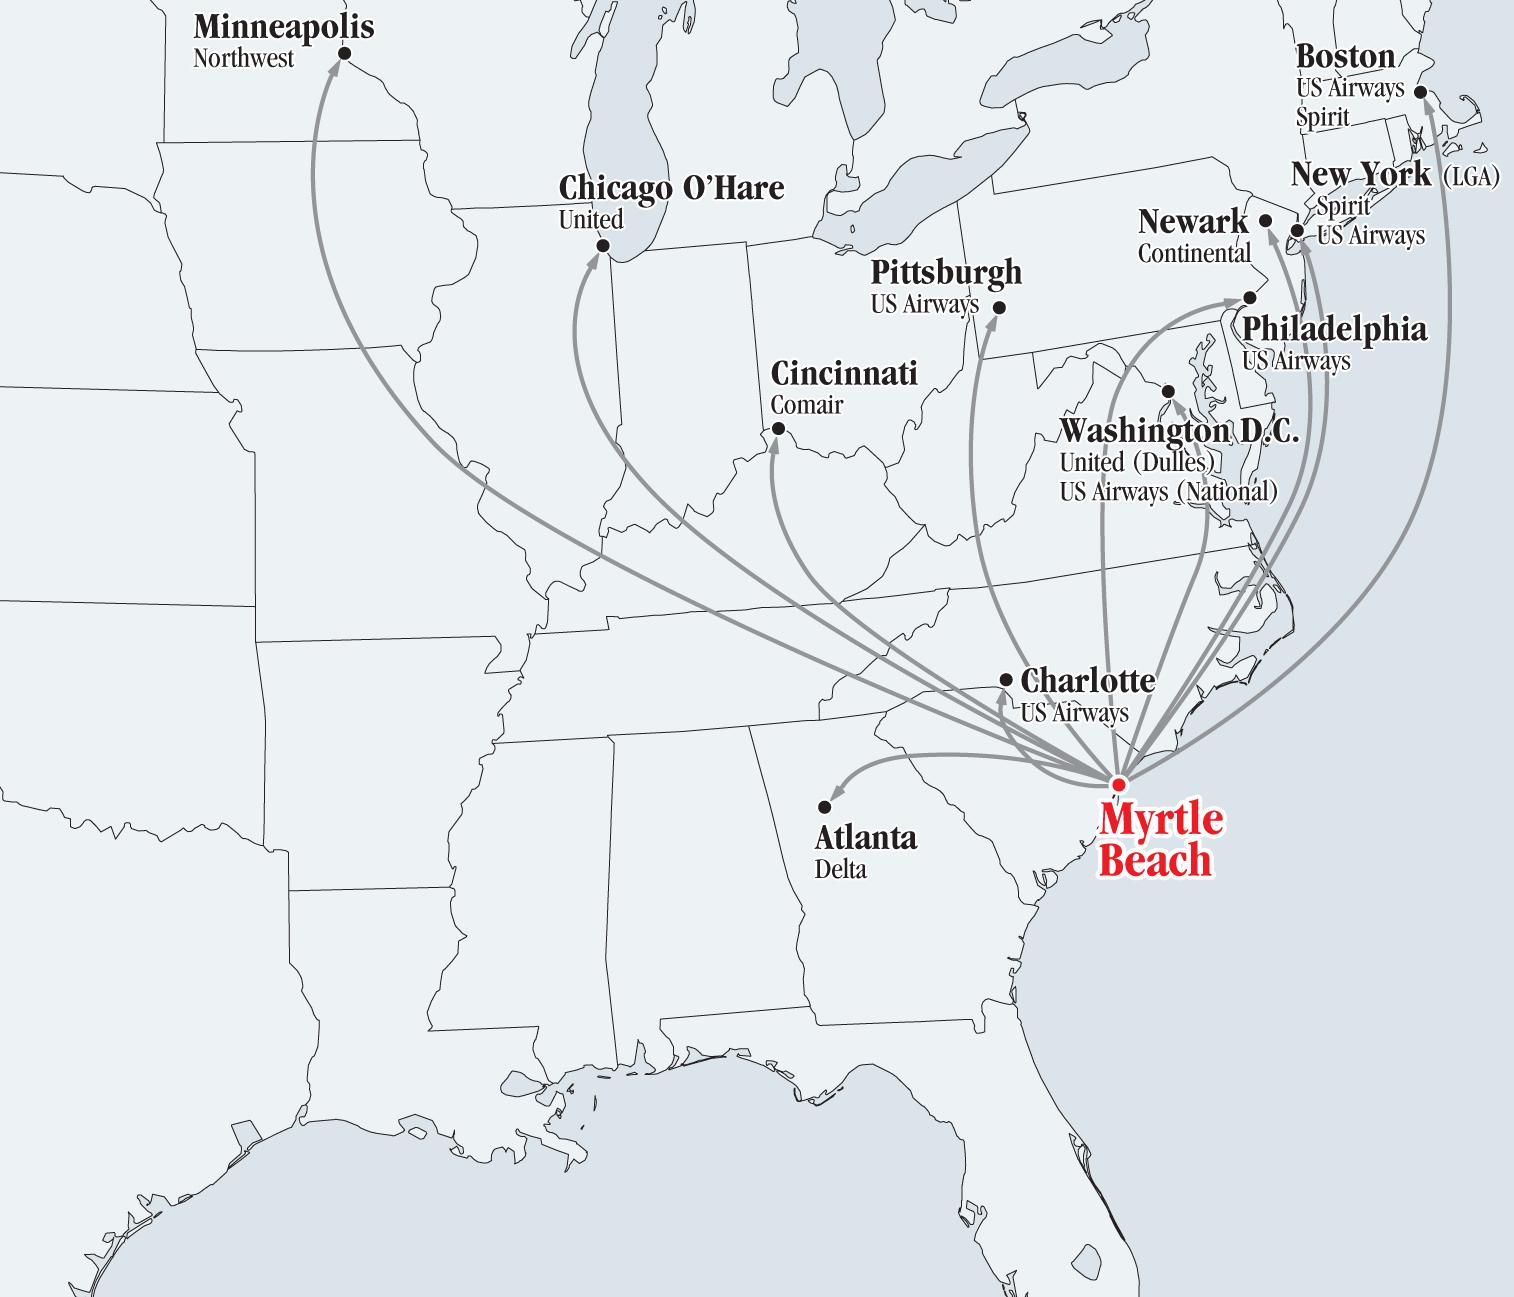 Direct Flights To South Carolina Myrtle Beach